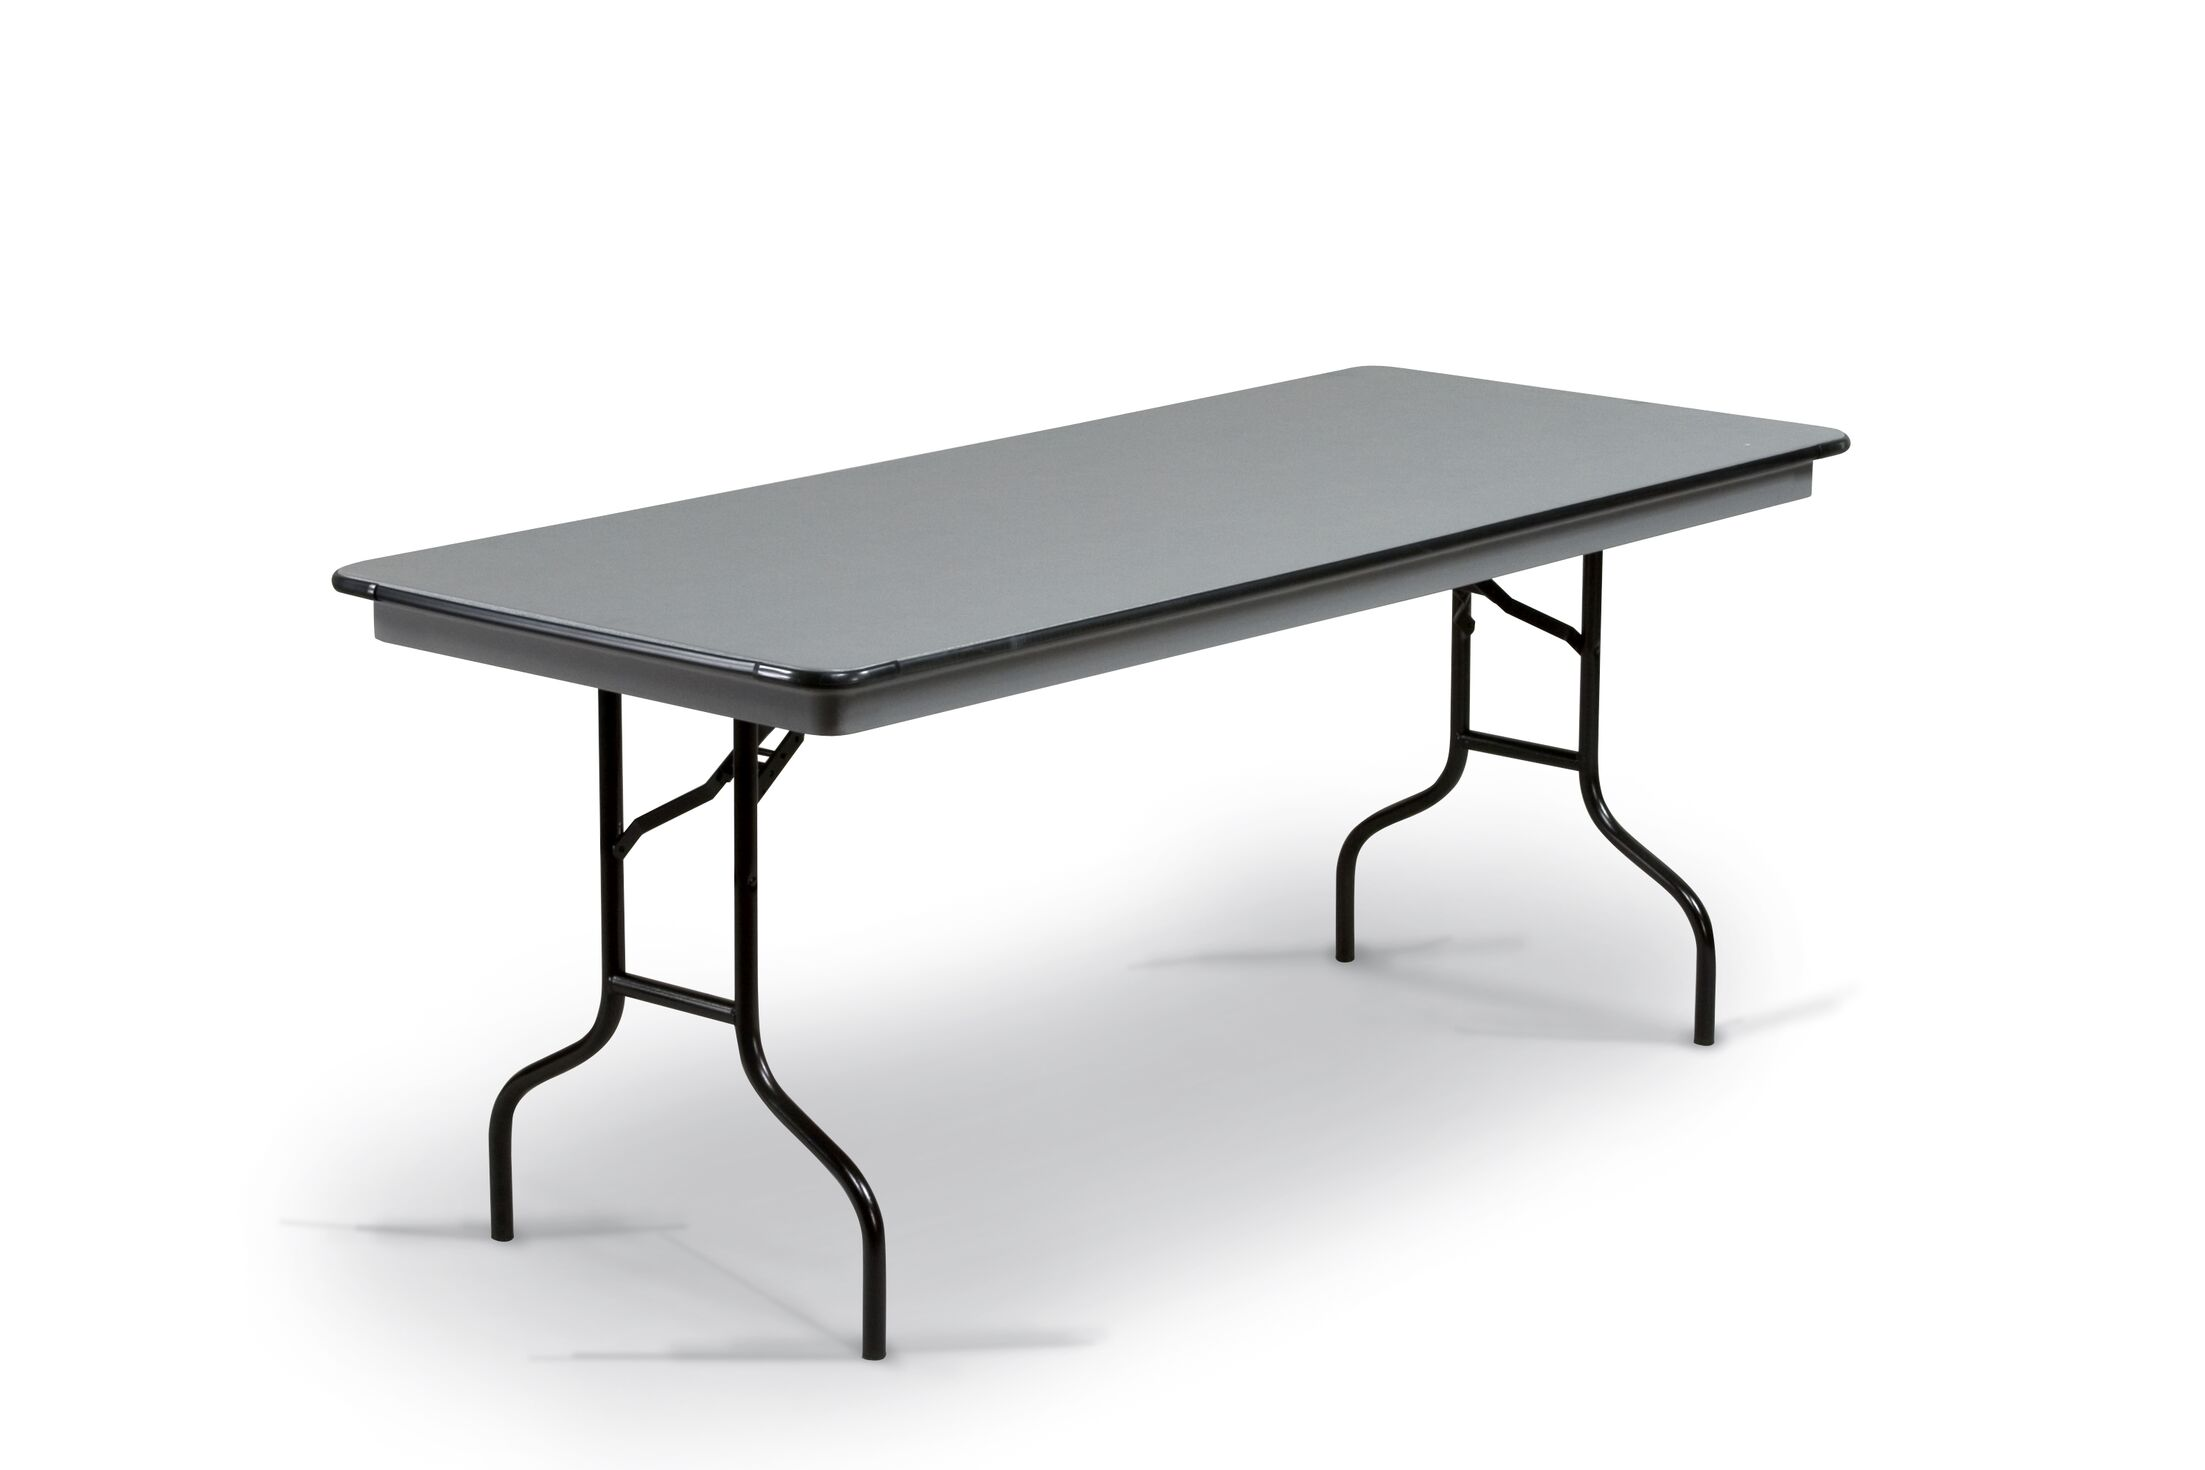 Hexalite Rectangular Conference Table Top Finish: Gray, Base Finish: Black, Size: 29